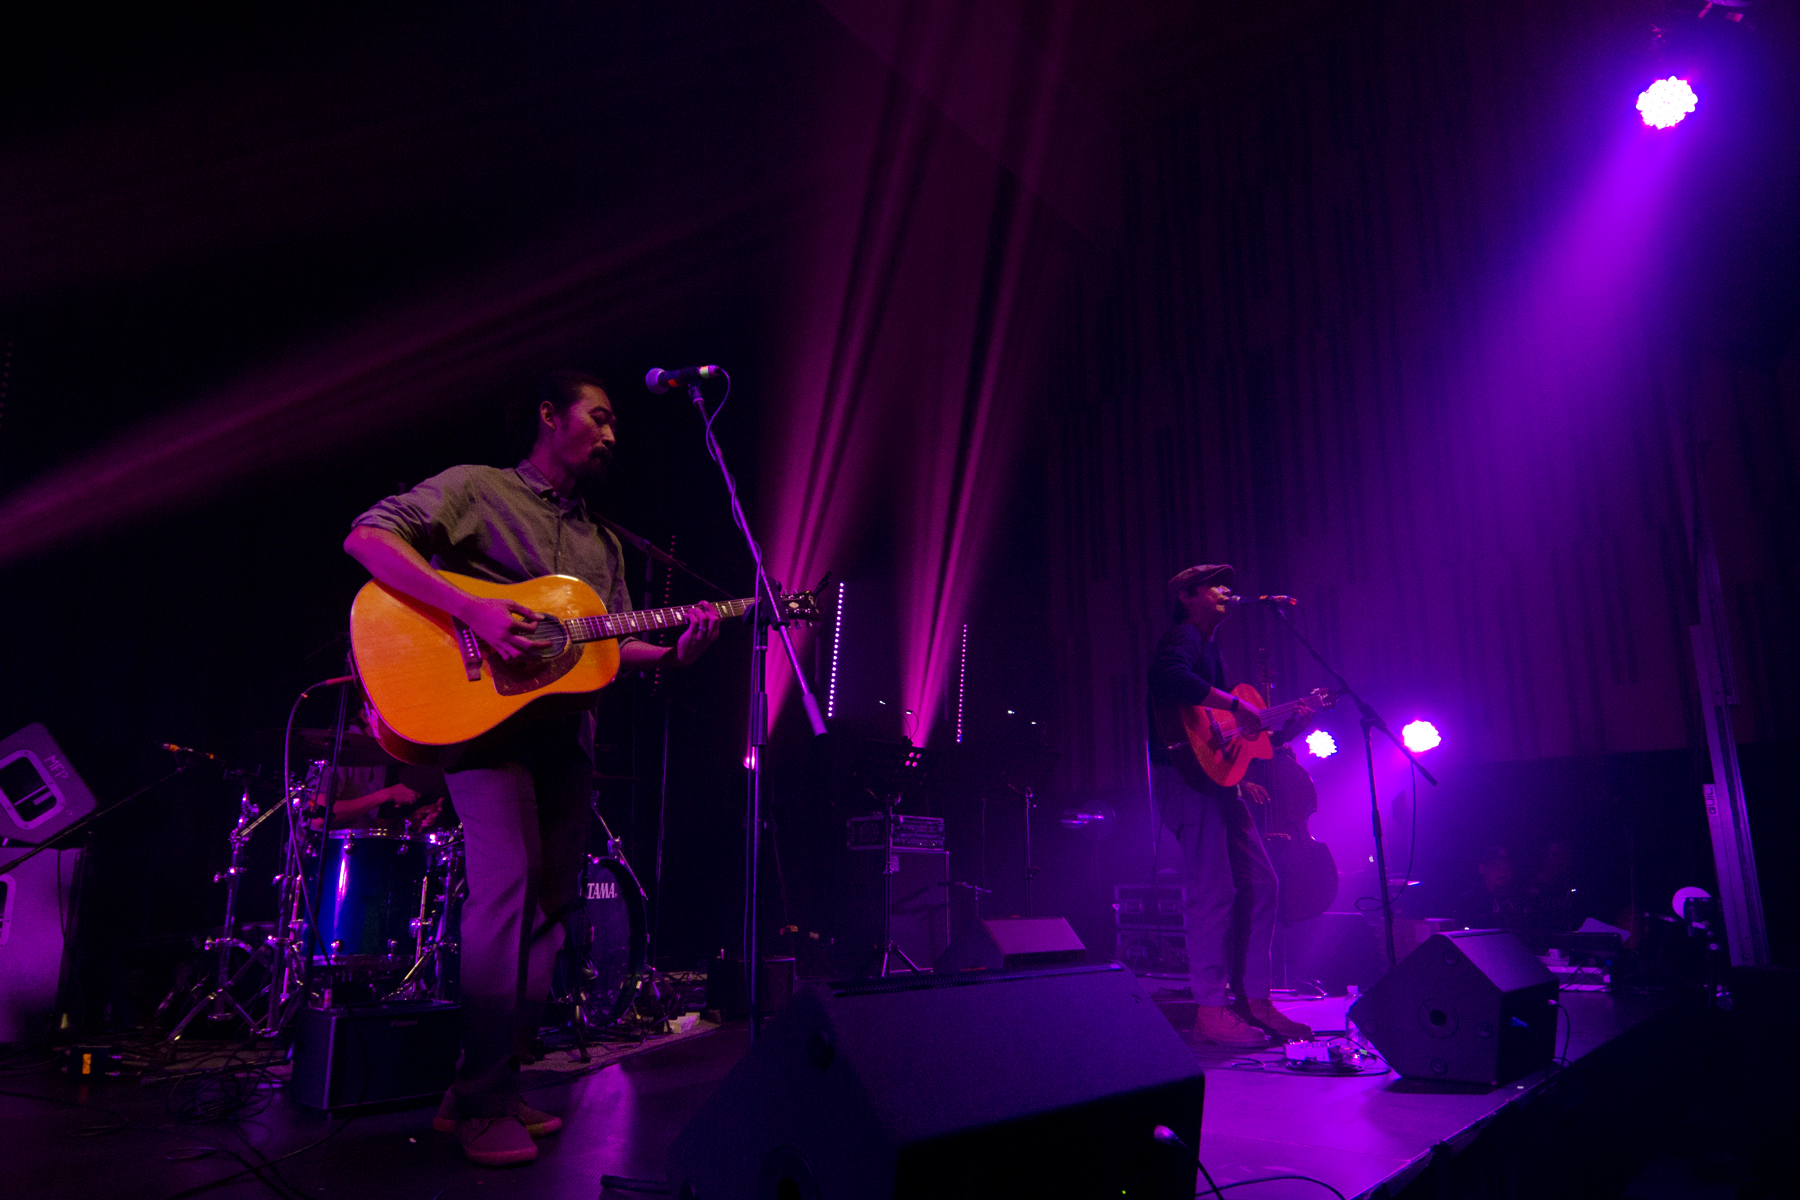 Silampukau - Live at Buka Panggung, 19/1/2019